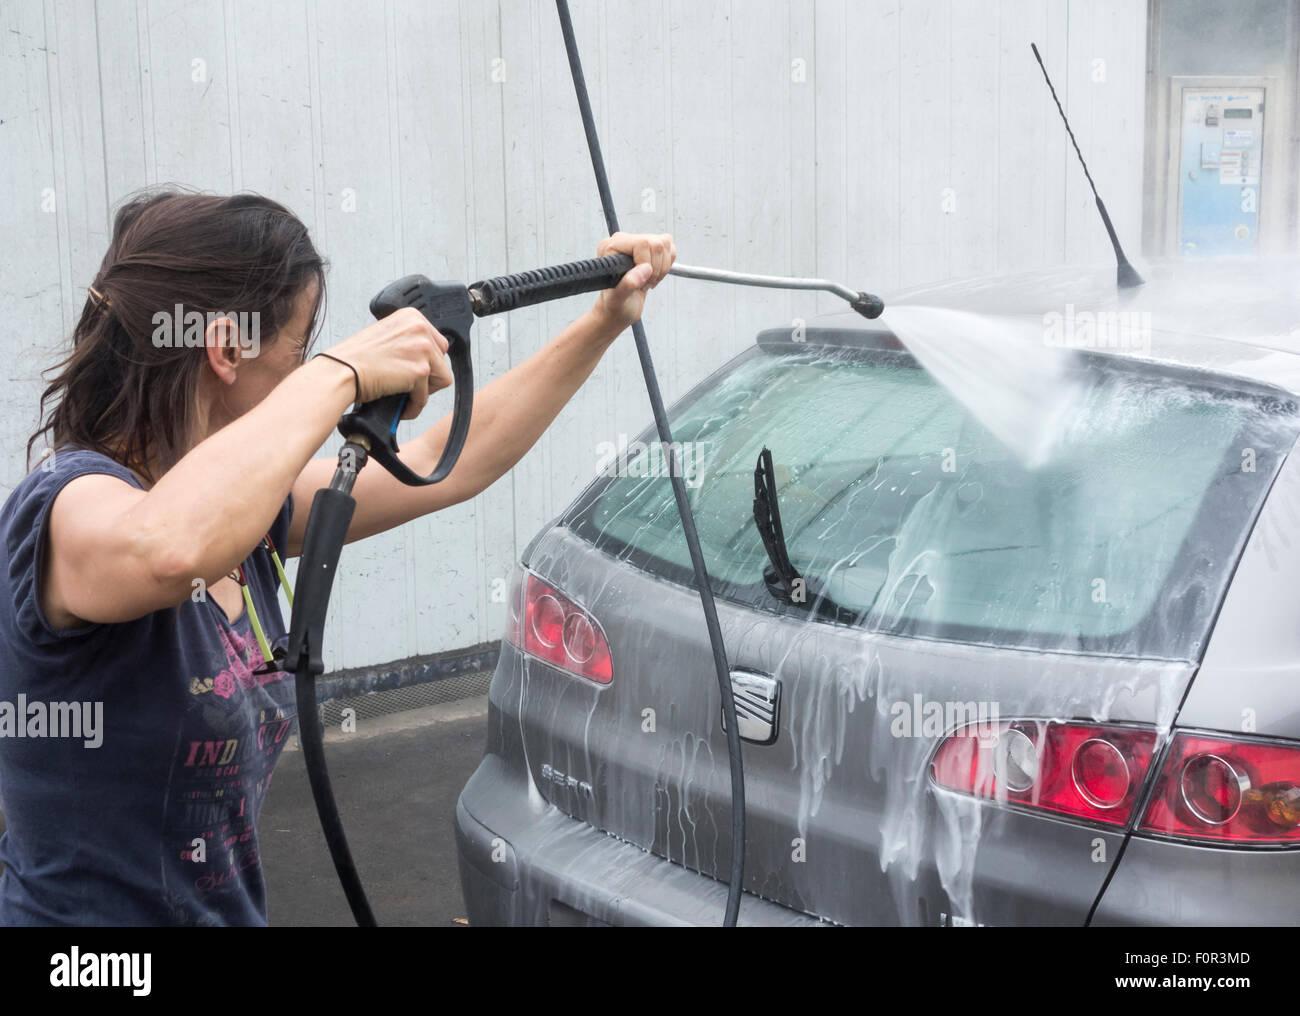 car washing stockfotos car washing bilder alamy. Black Bedroom Furniture Sets. Home Design Ideas